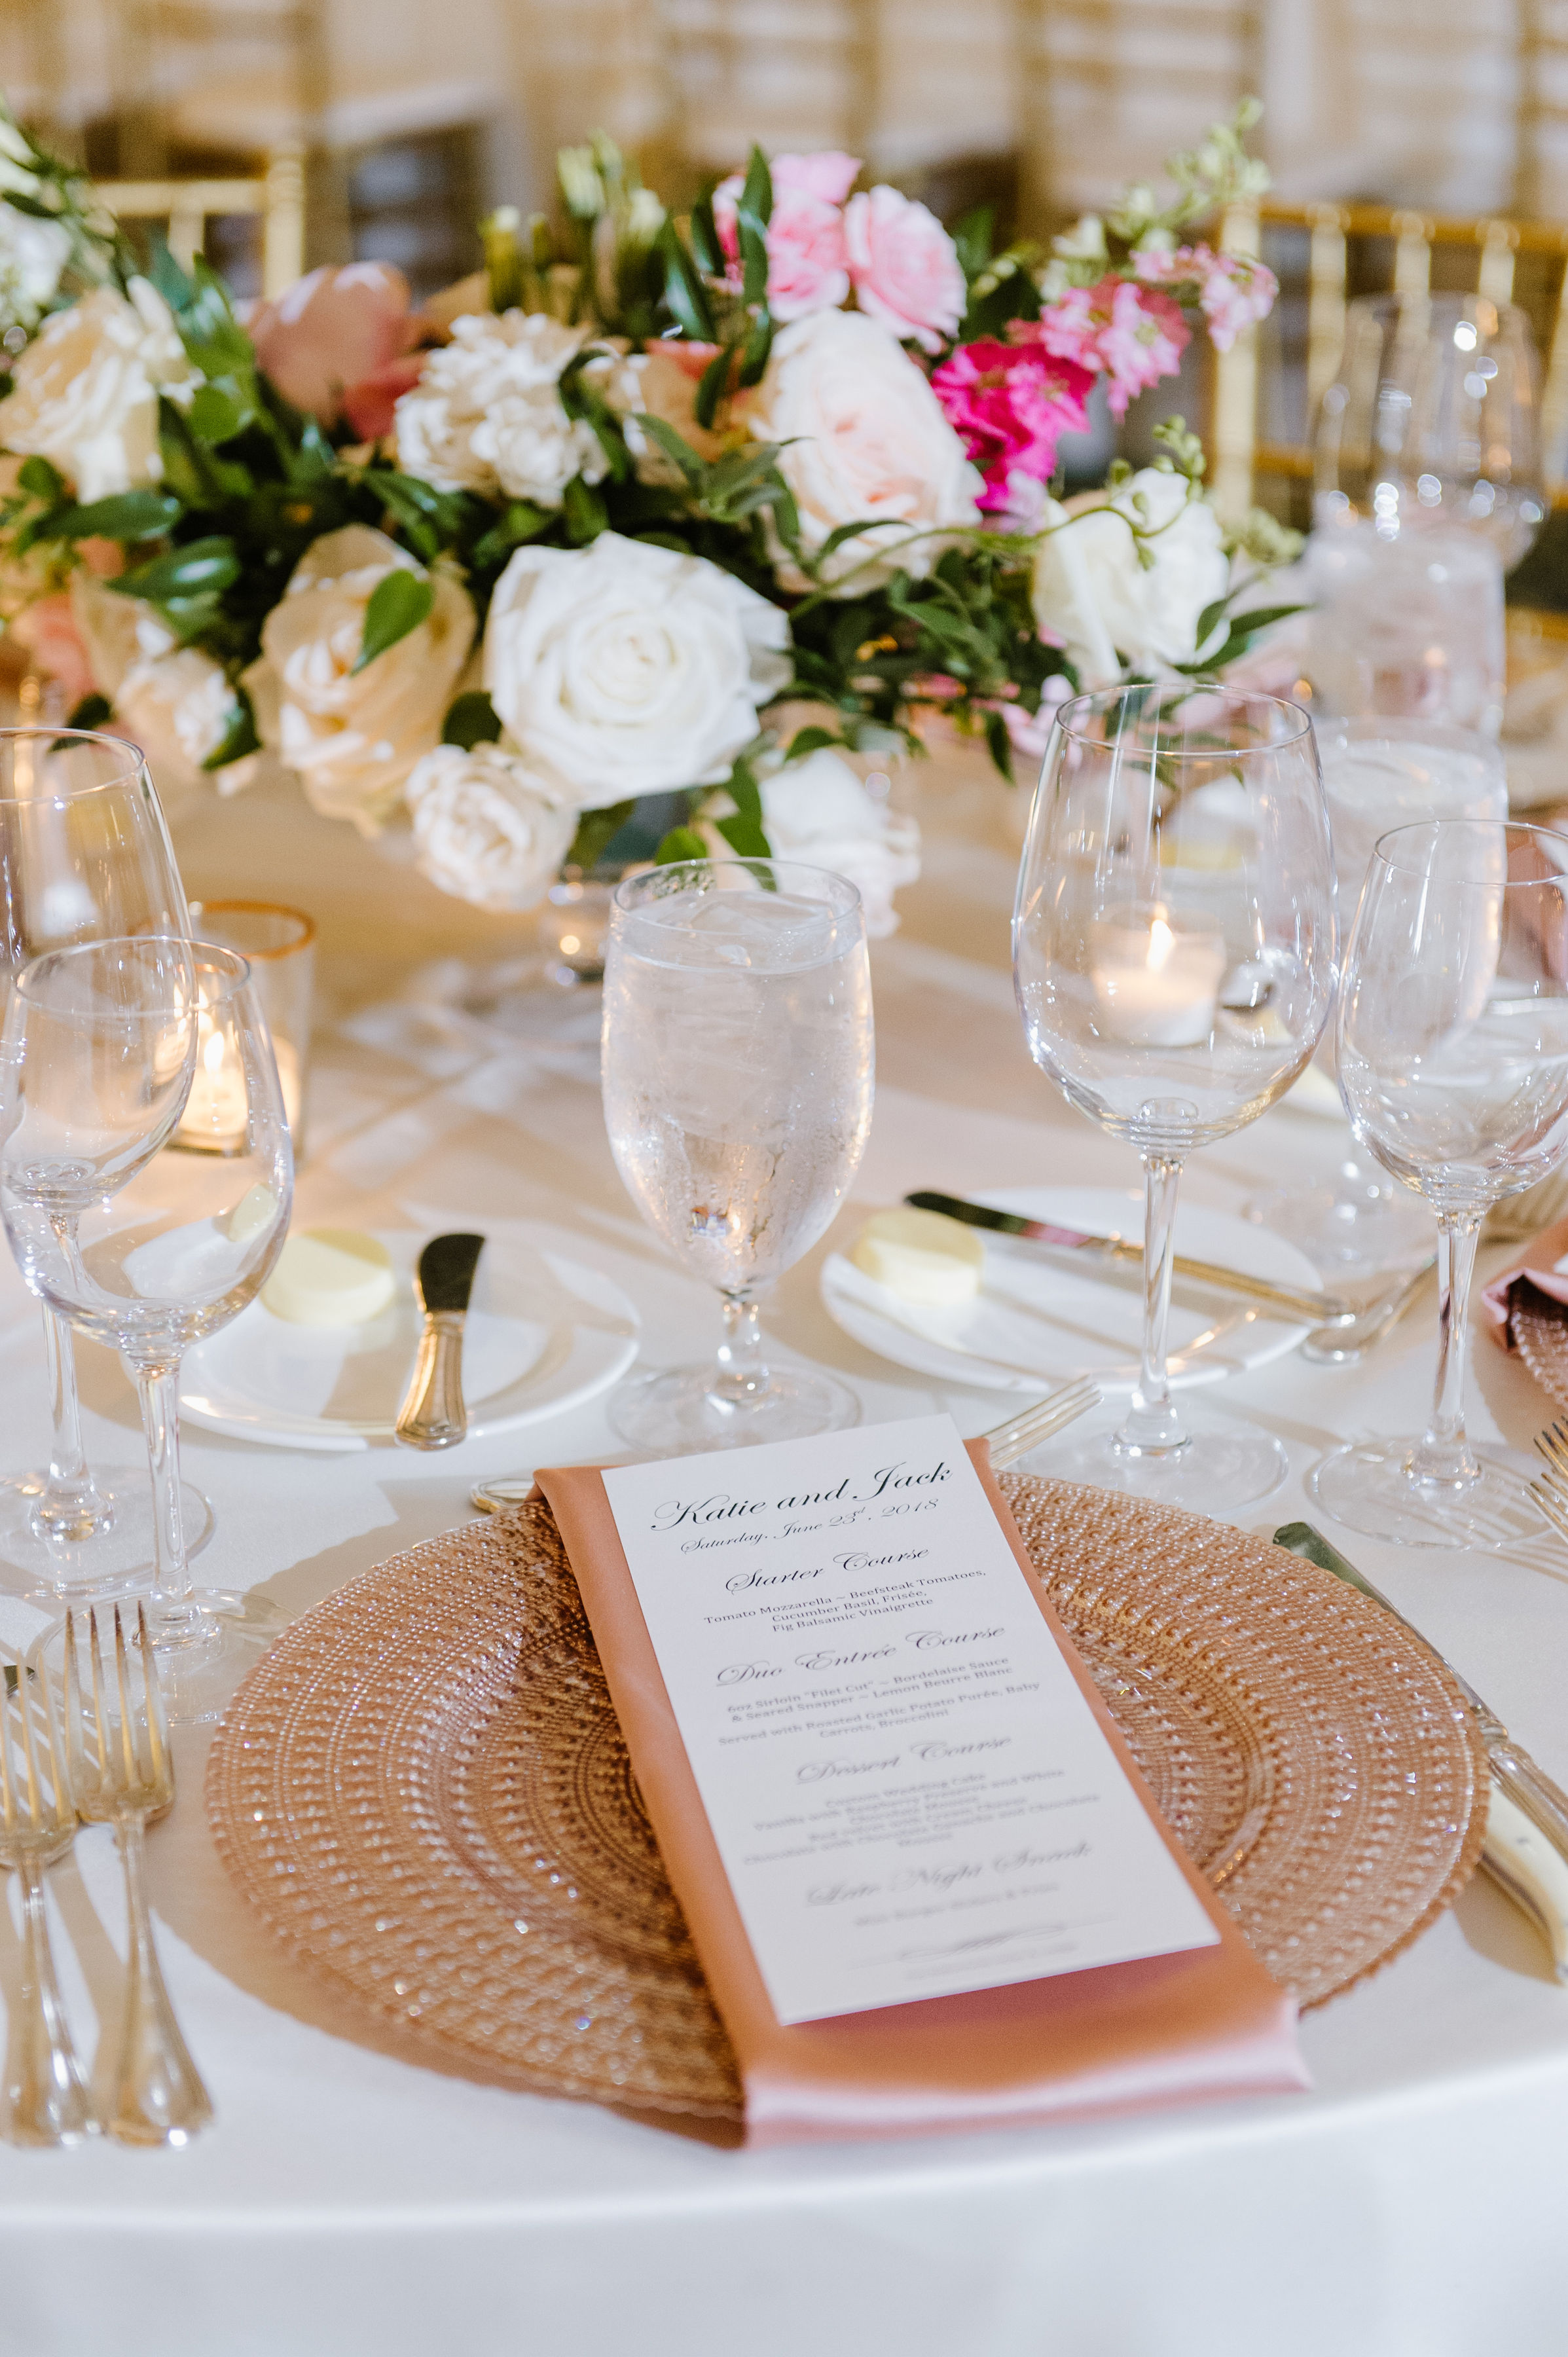 McElravey_Wedding_CarolineLimaPhotography_2018_283.jpg